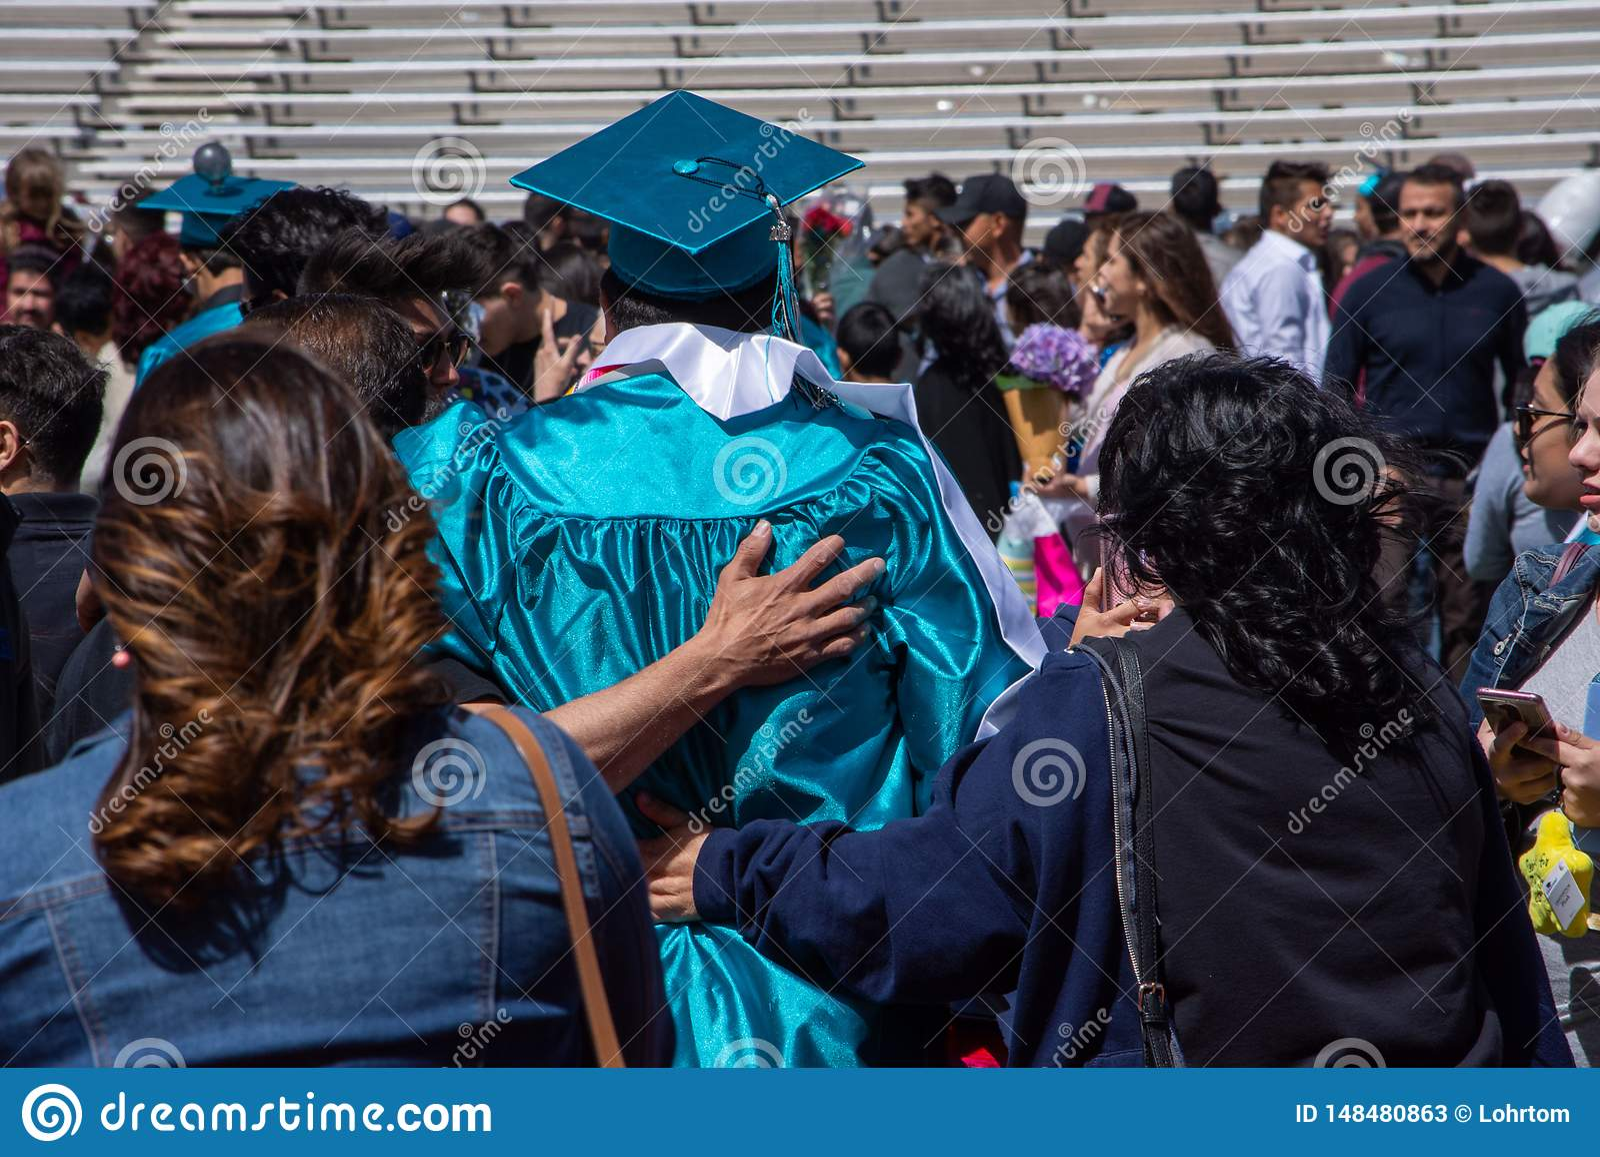 2019 Capital High School Graduation In Santa Fe Nm Editorial Stock Photo Image Of Grad Mexico 148480863